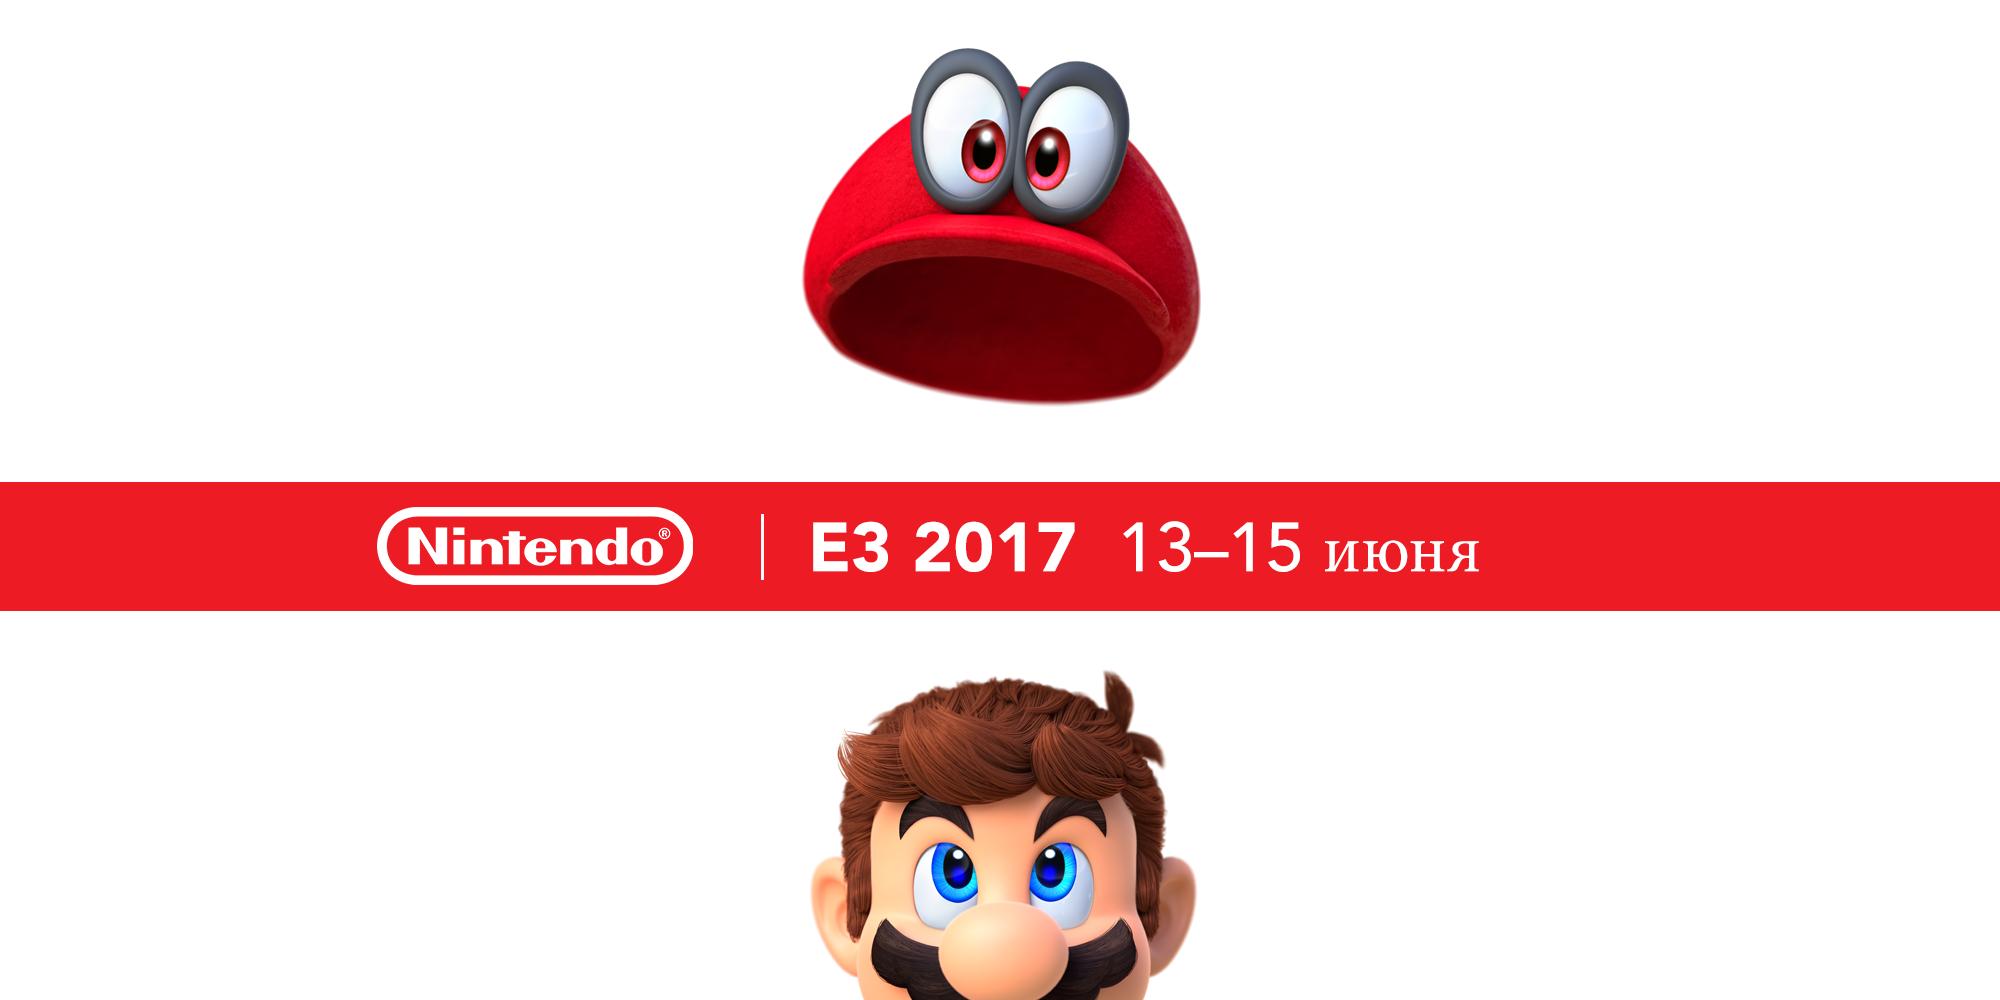 Nintendo проведет ряд мероприятий на E3